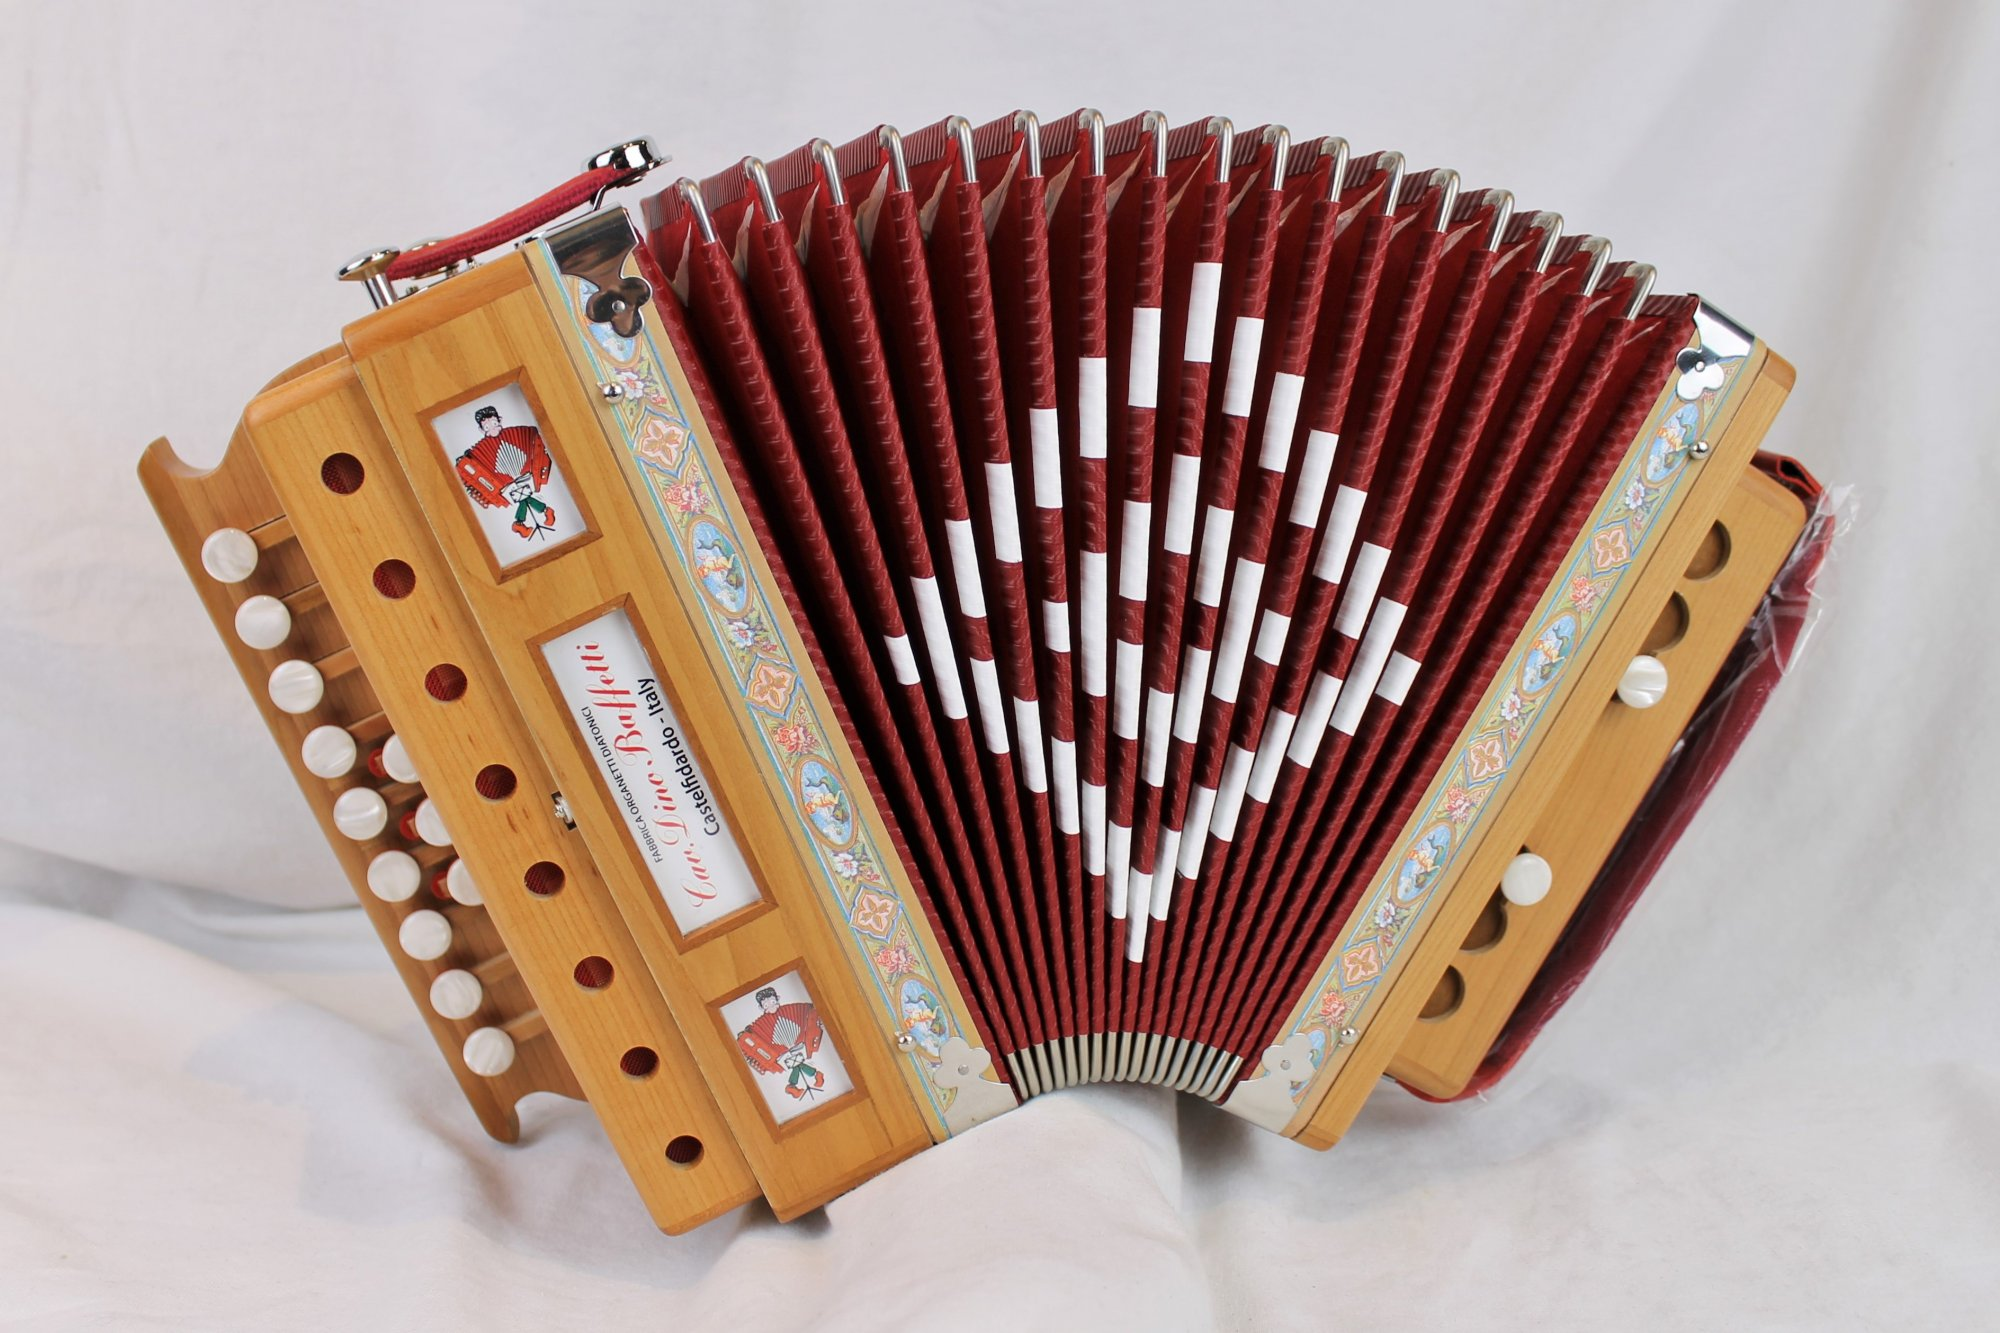 NEW Cherry Dino Baffetti Art. 25 Organetto Diatonic Button Accordion G LMM 12 2